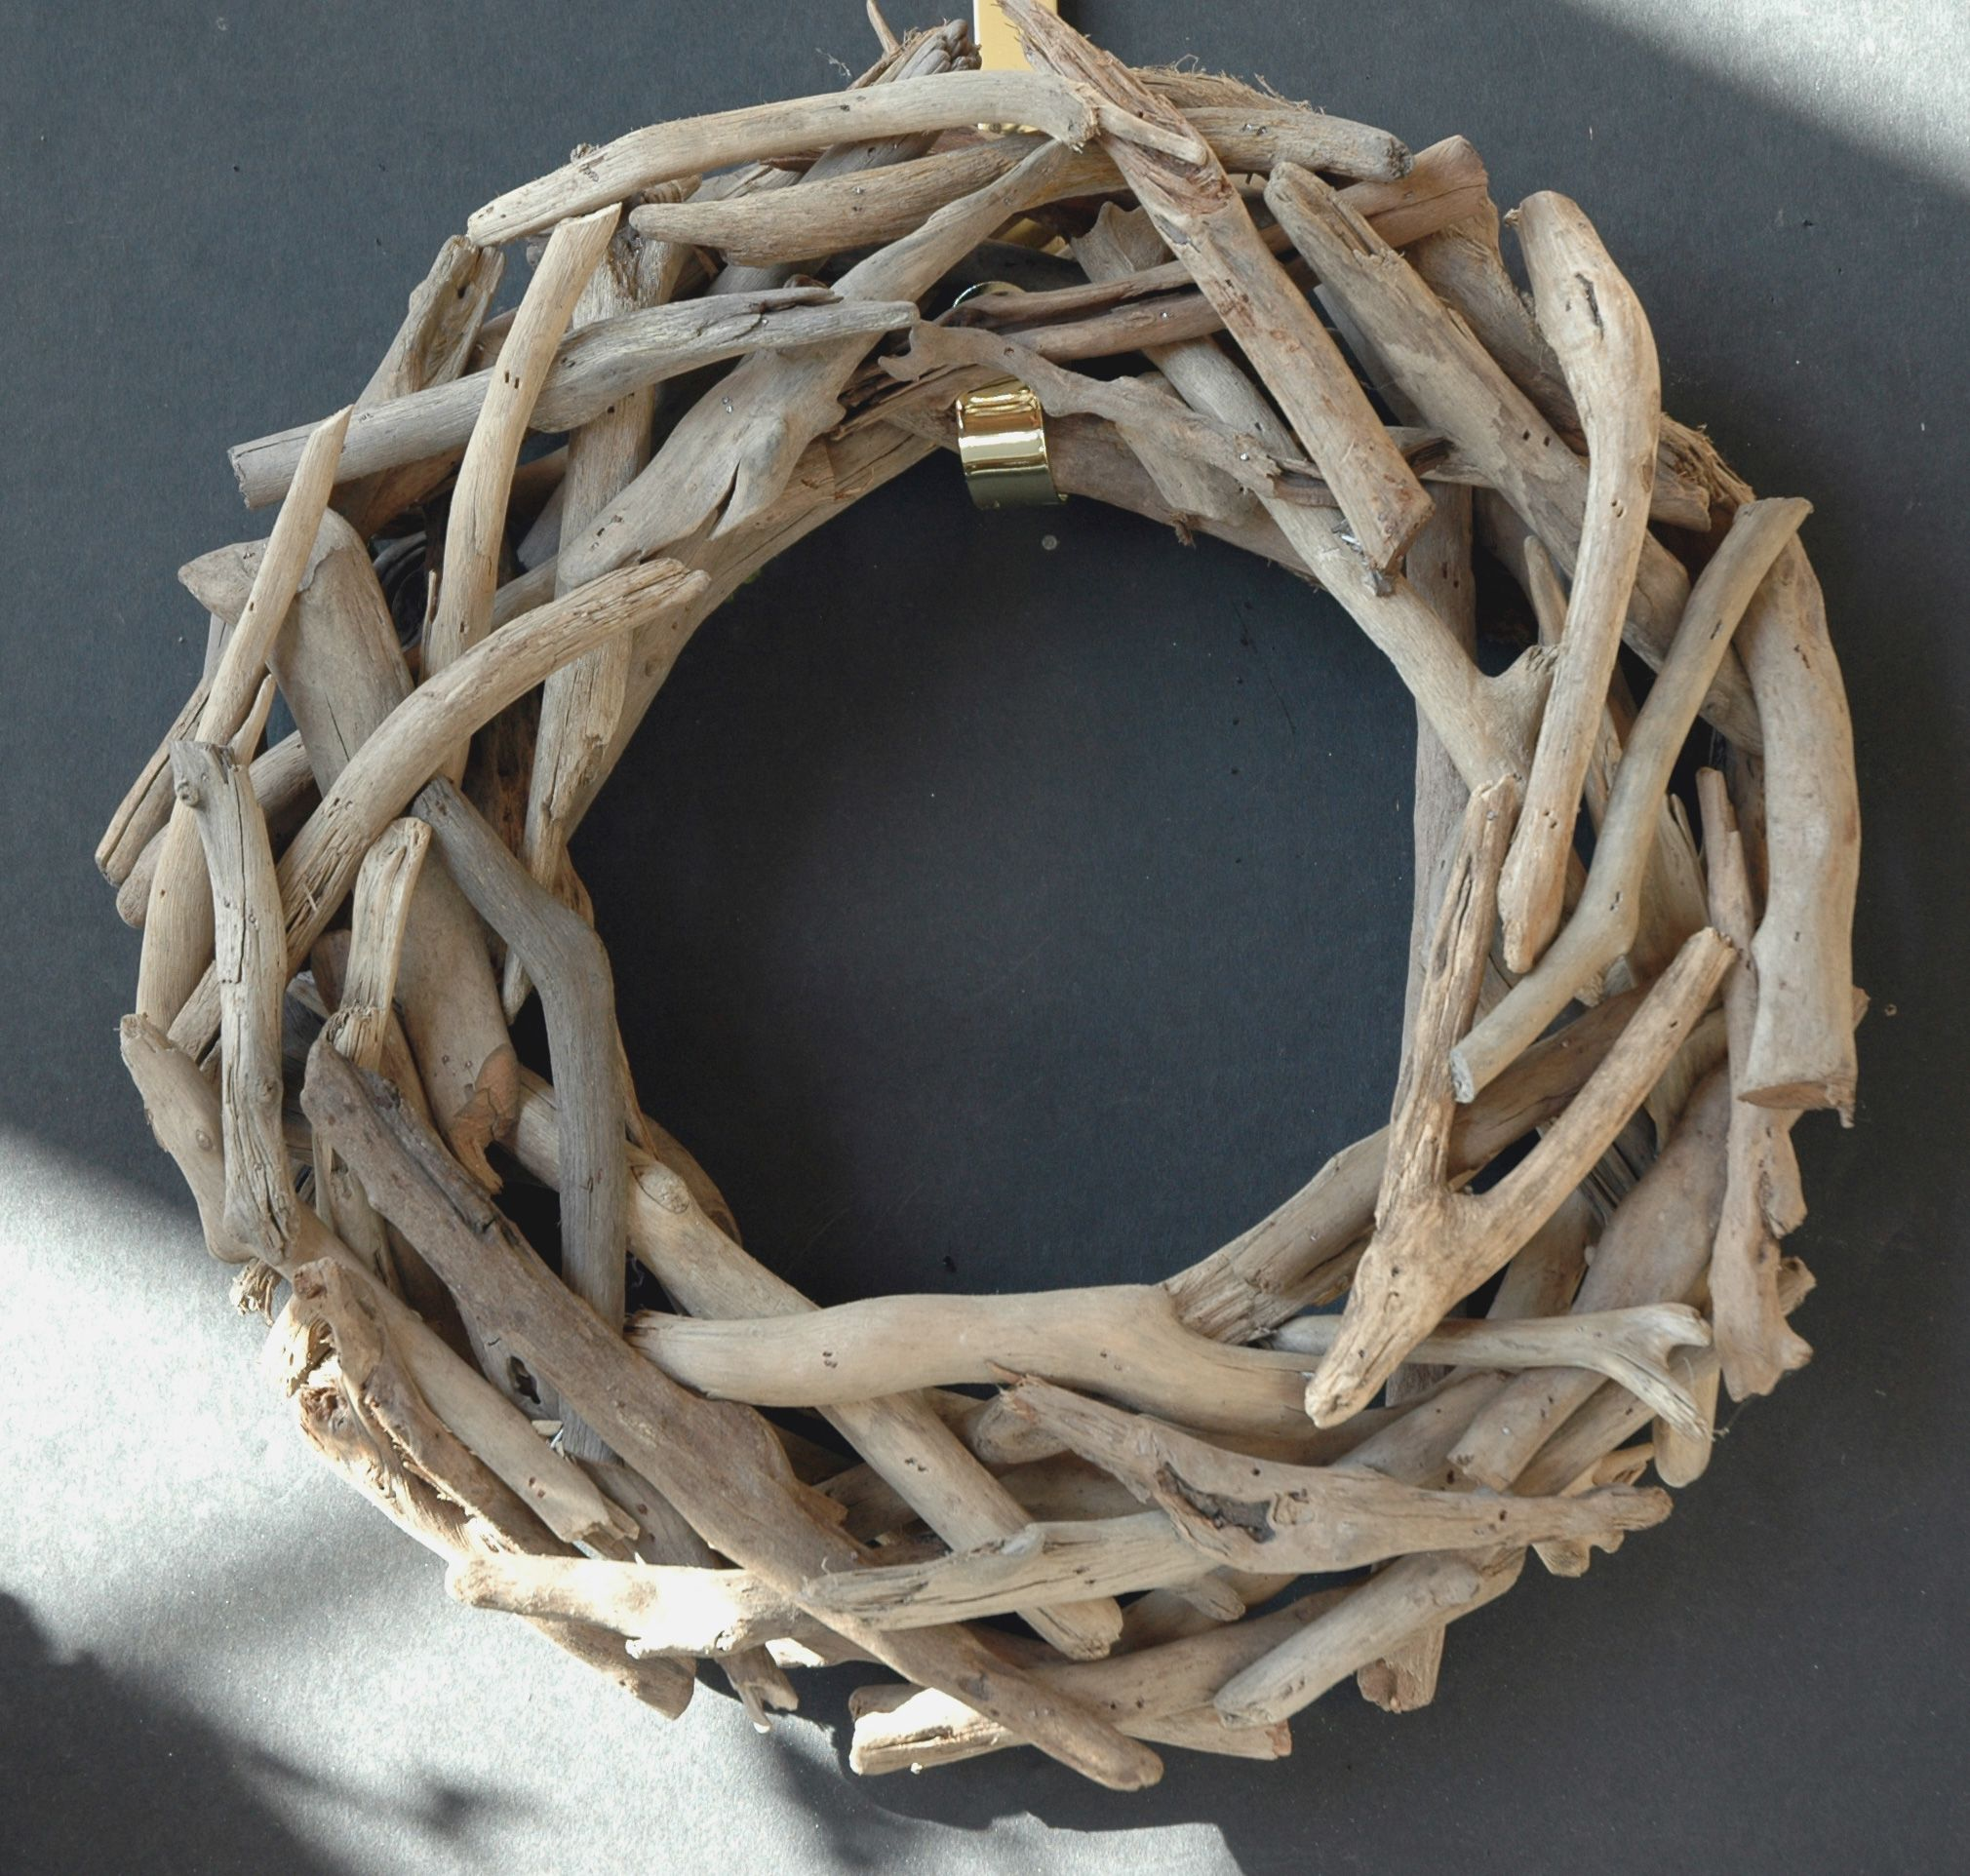 Driftwood Wreath  Rustic Americana Living Room. Handicapped Showers. White Shutters. 7 X 9 Area Rug. Gray Bathroom Vanity. 30 Inch Vanity. Elberton Way House Plan. Rustic Beach House. 12x15